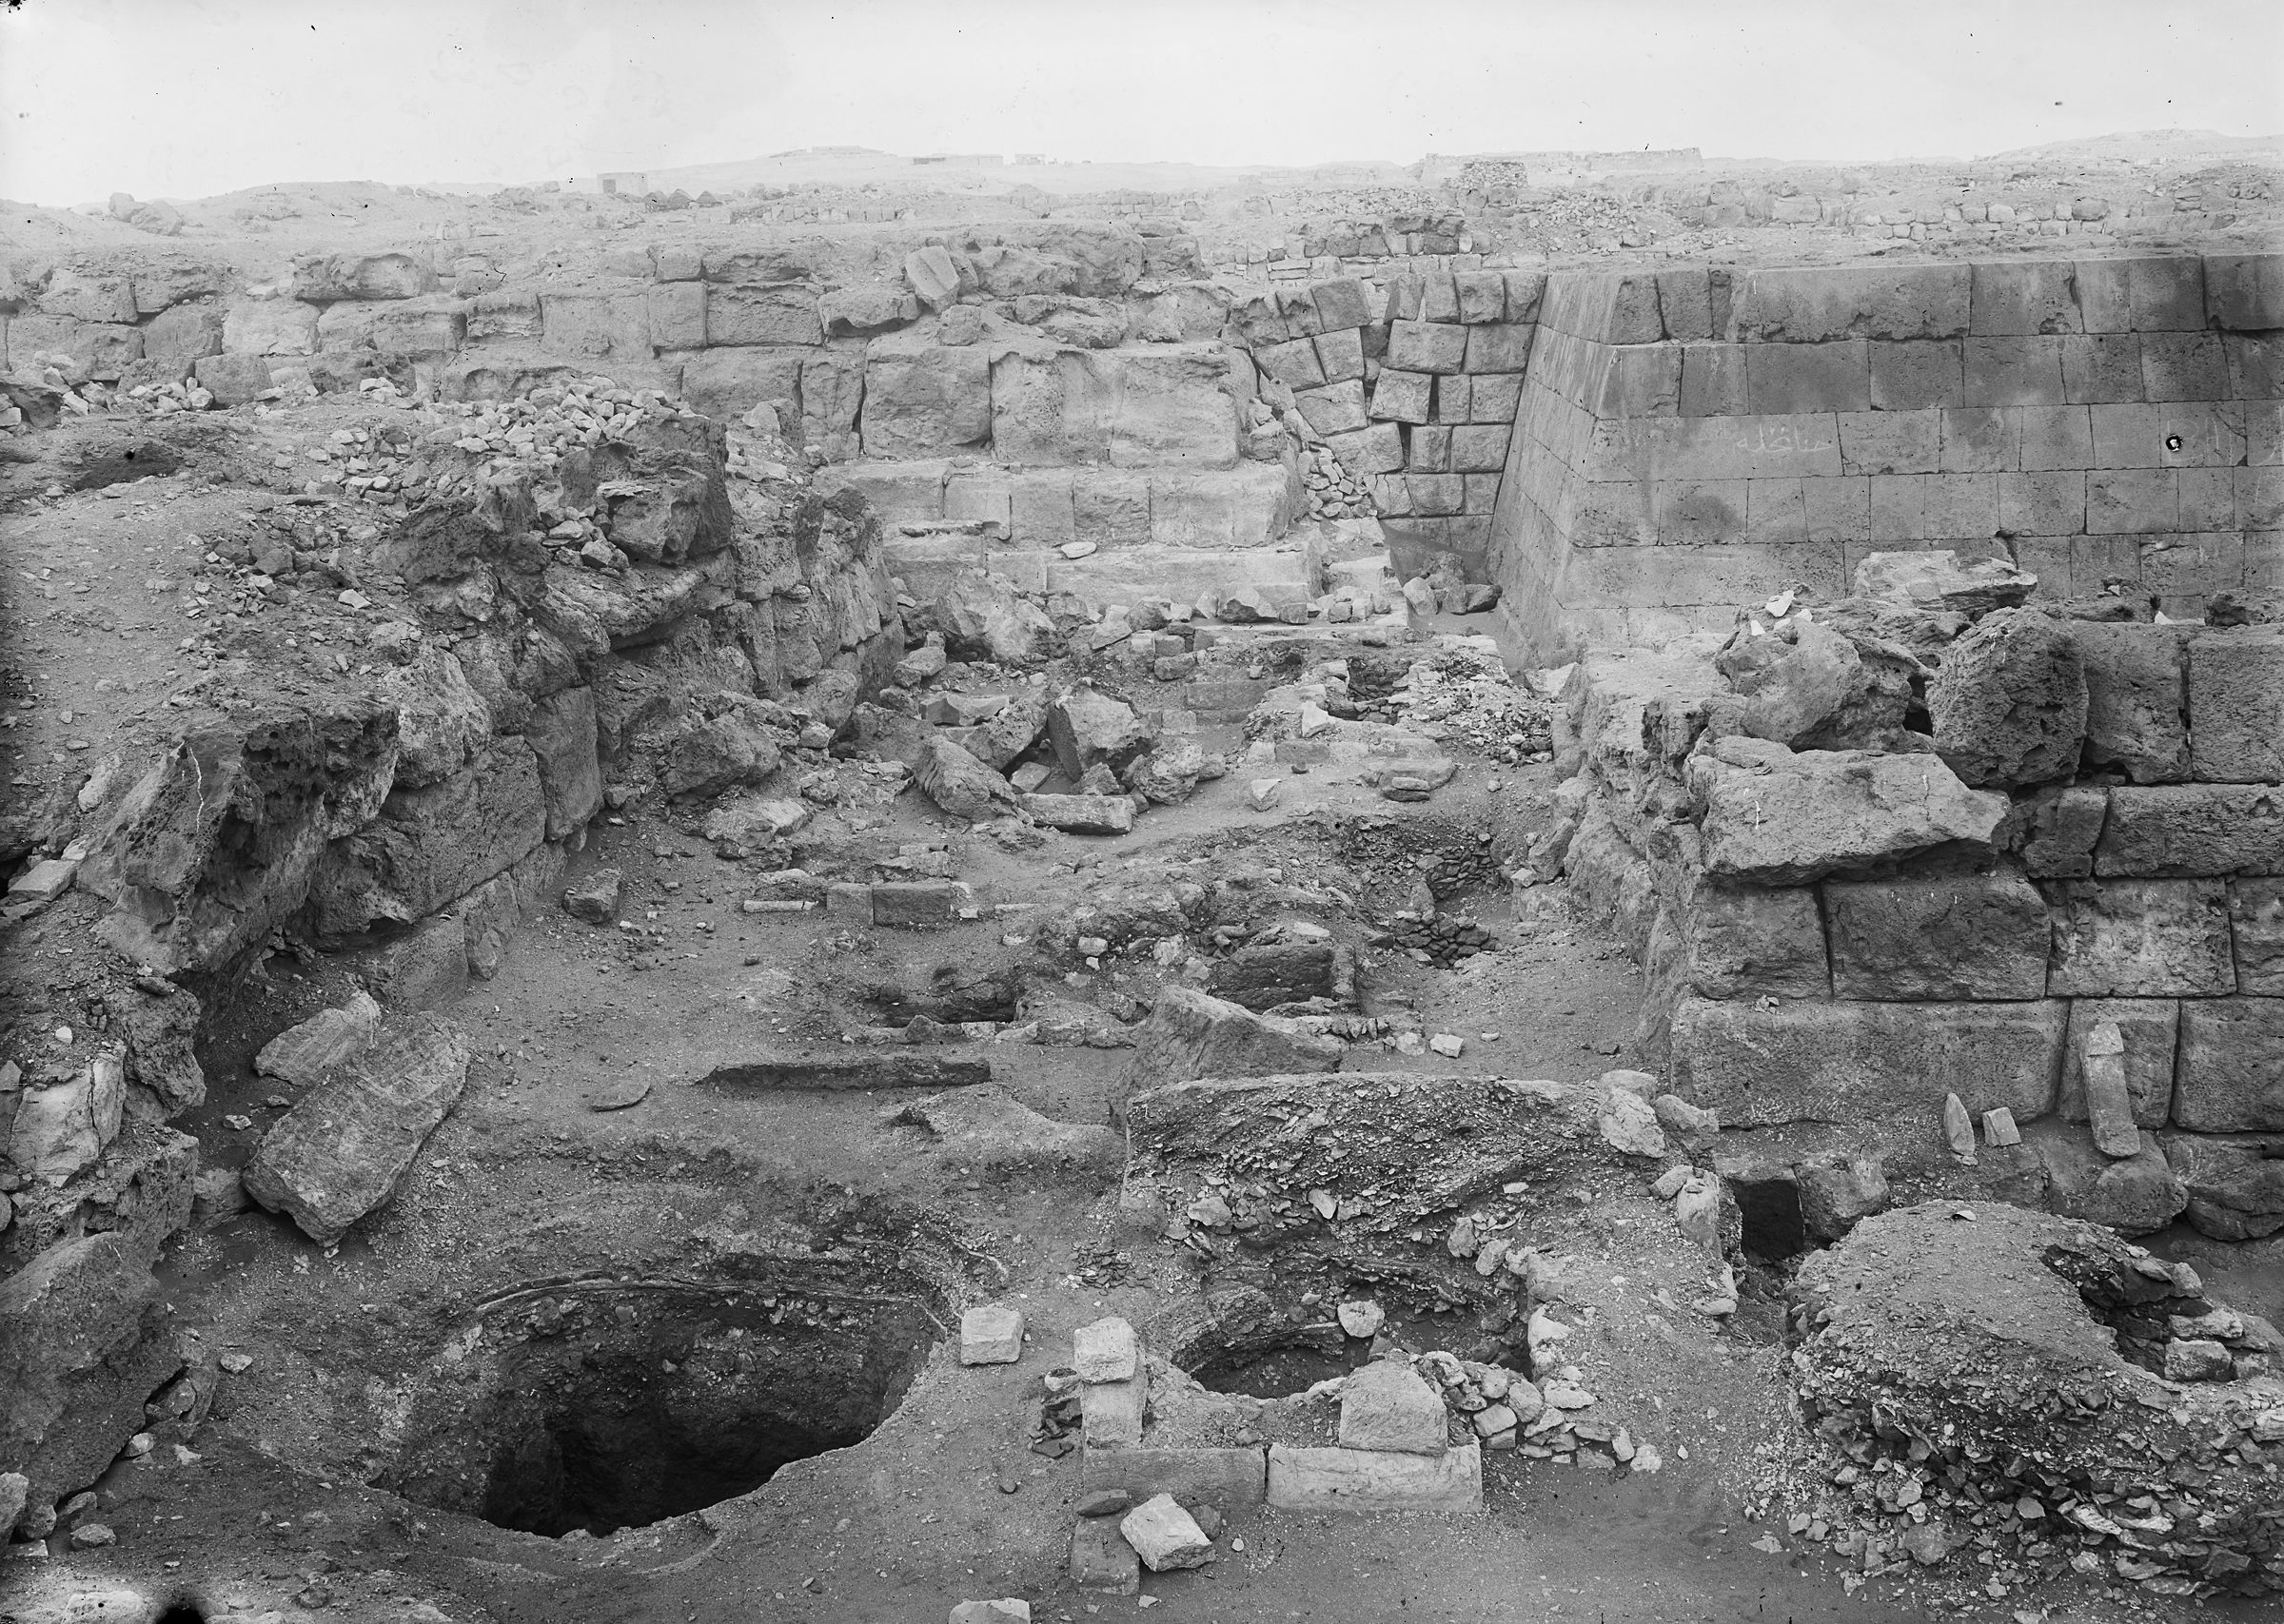 Western Cemetery: Site: Giza; View: G 5220, G 5230, G 5222, G 5223, G 5224, G 5225, G 5226